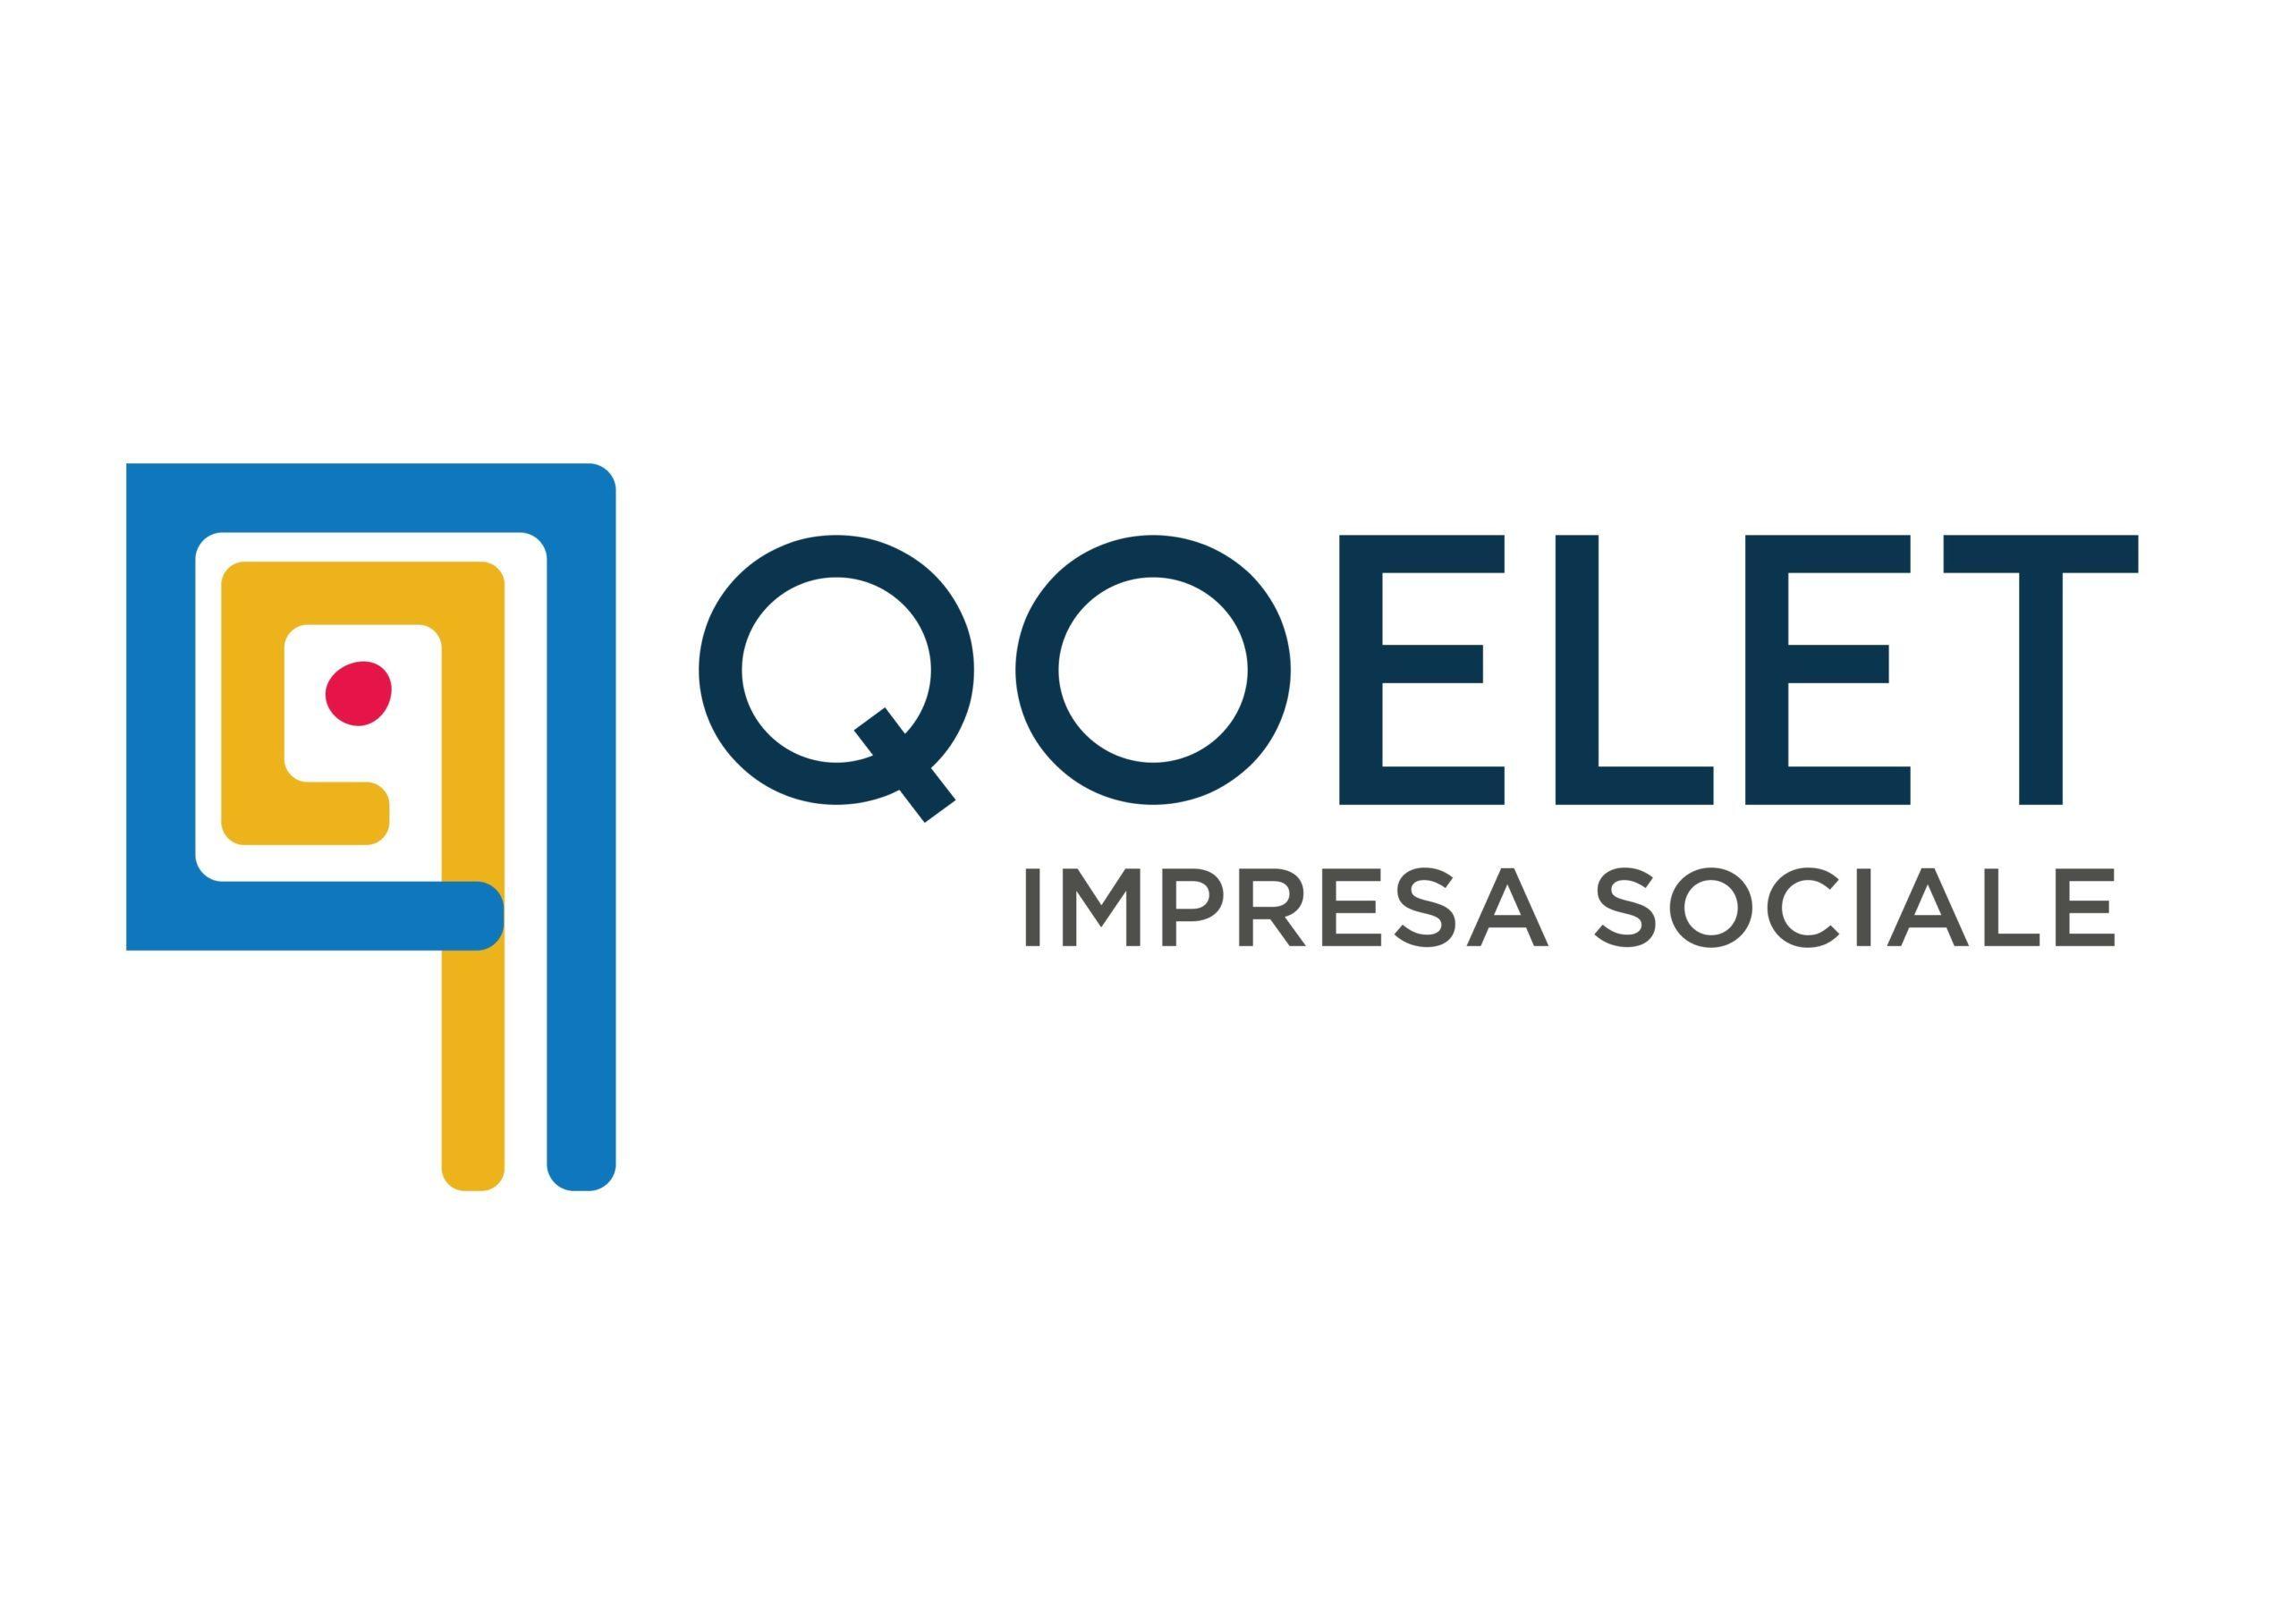 QOELET Impresa Sociale